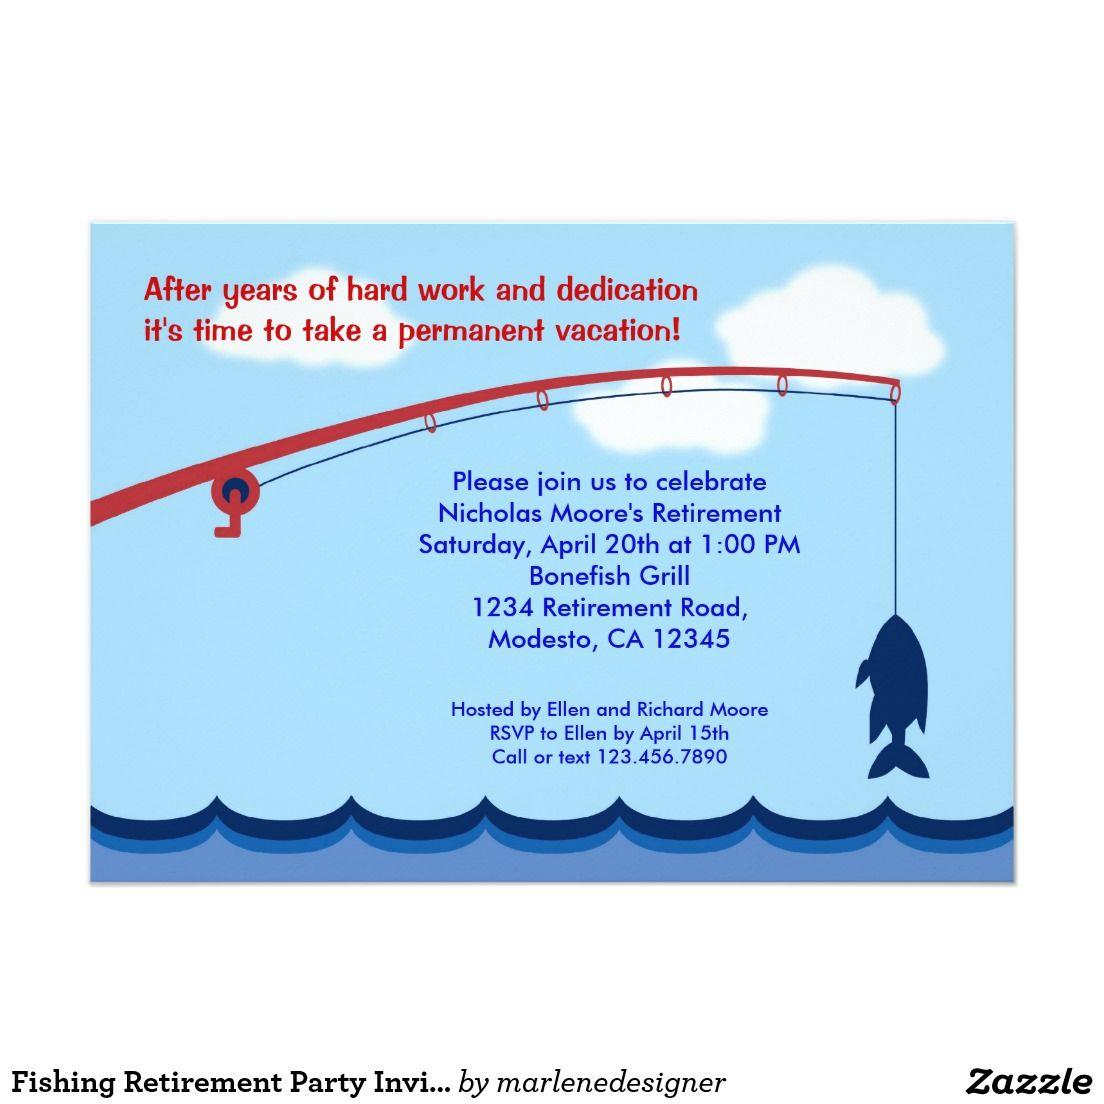 Fishing Retirement Party Invitation | Retirement party | Pinterest ...